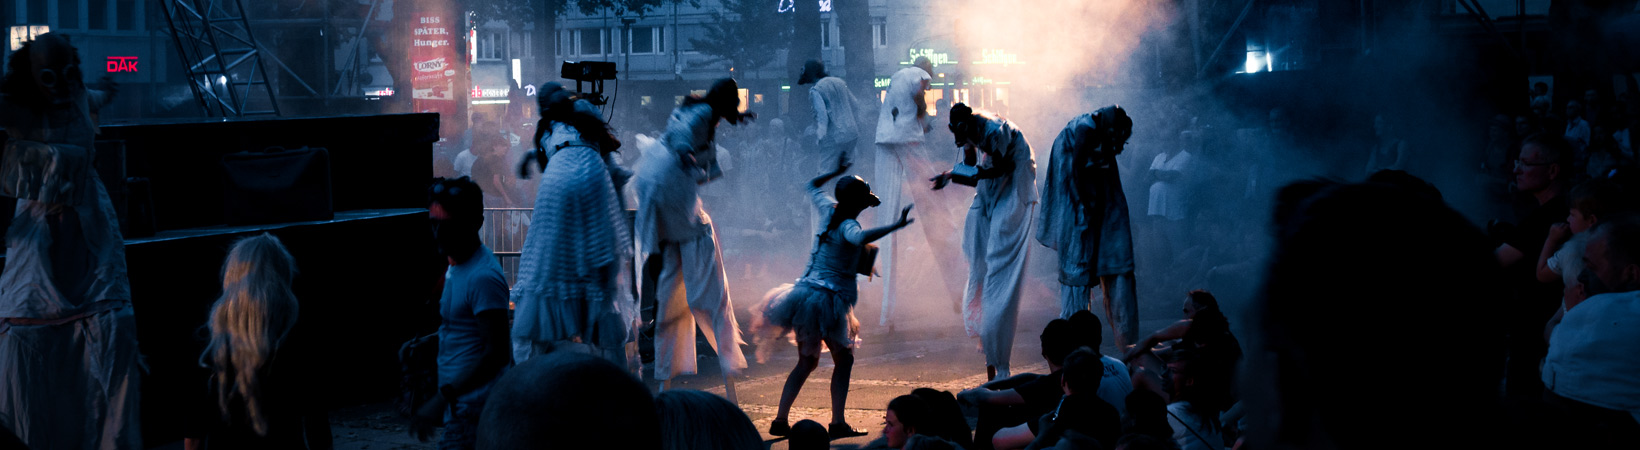 "Sommer.Köln Performance ""Gingko"" auf dem Kölner Neumarkt"